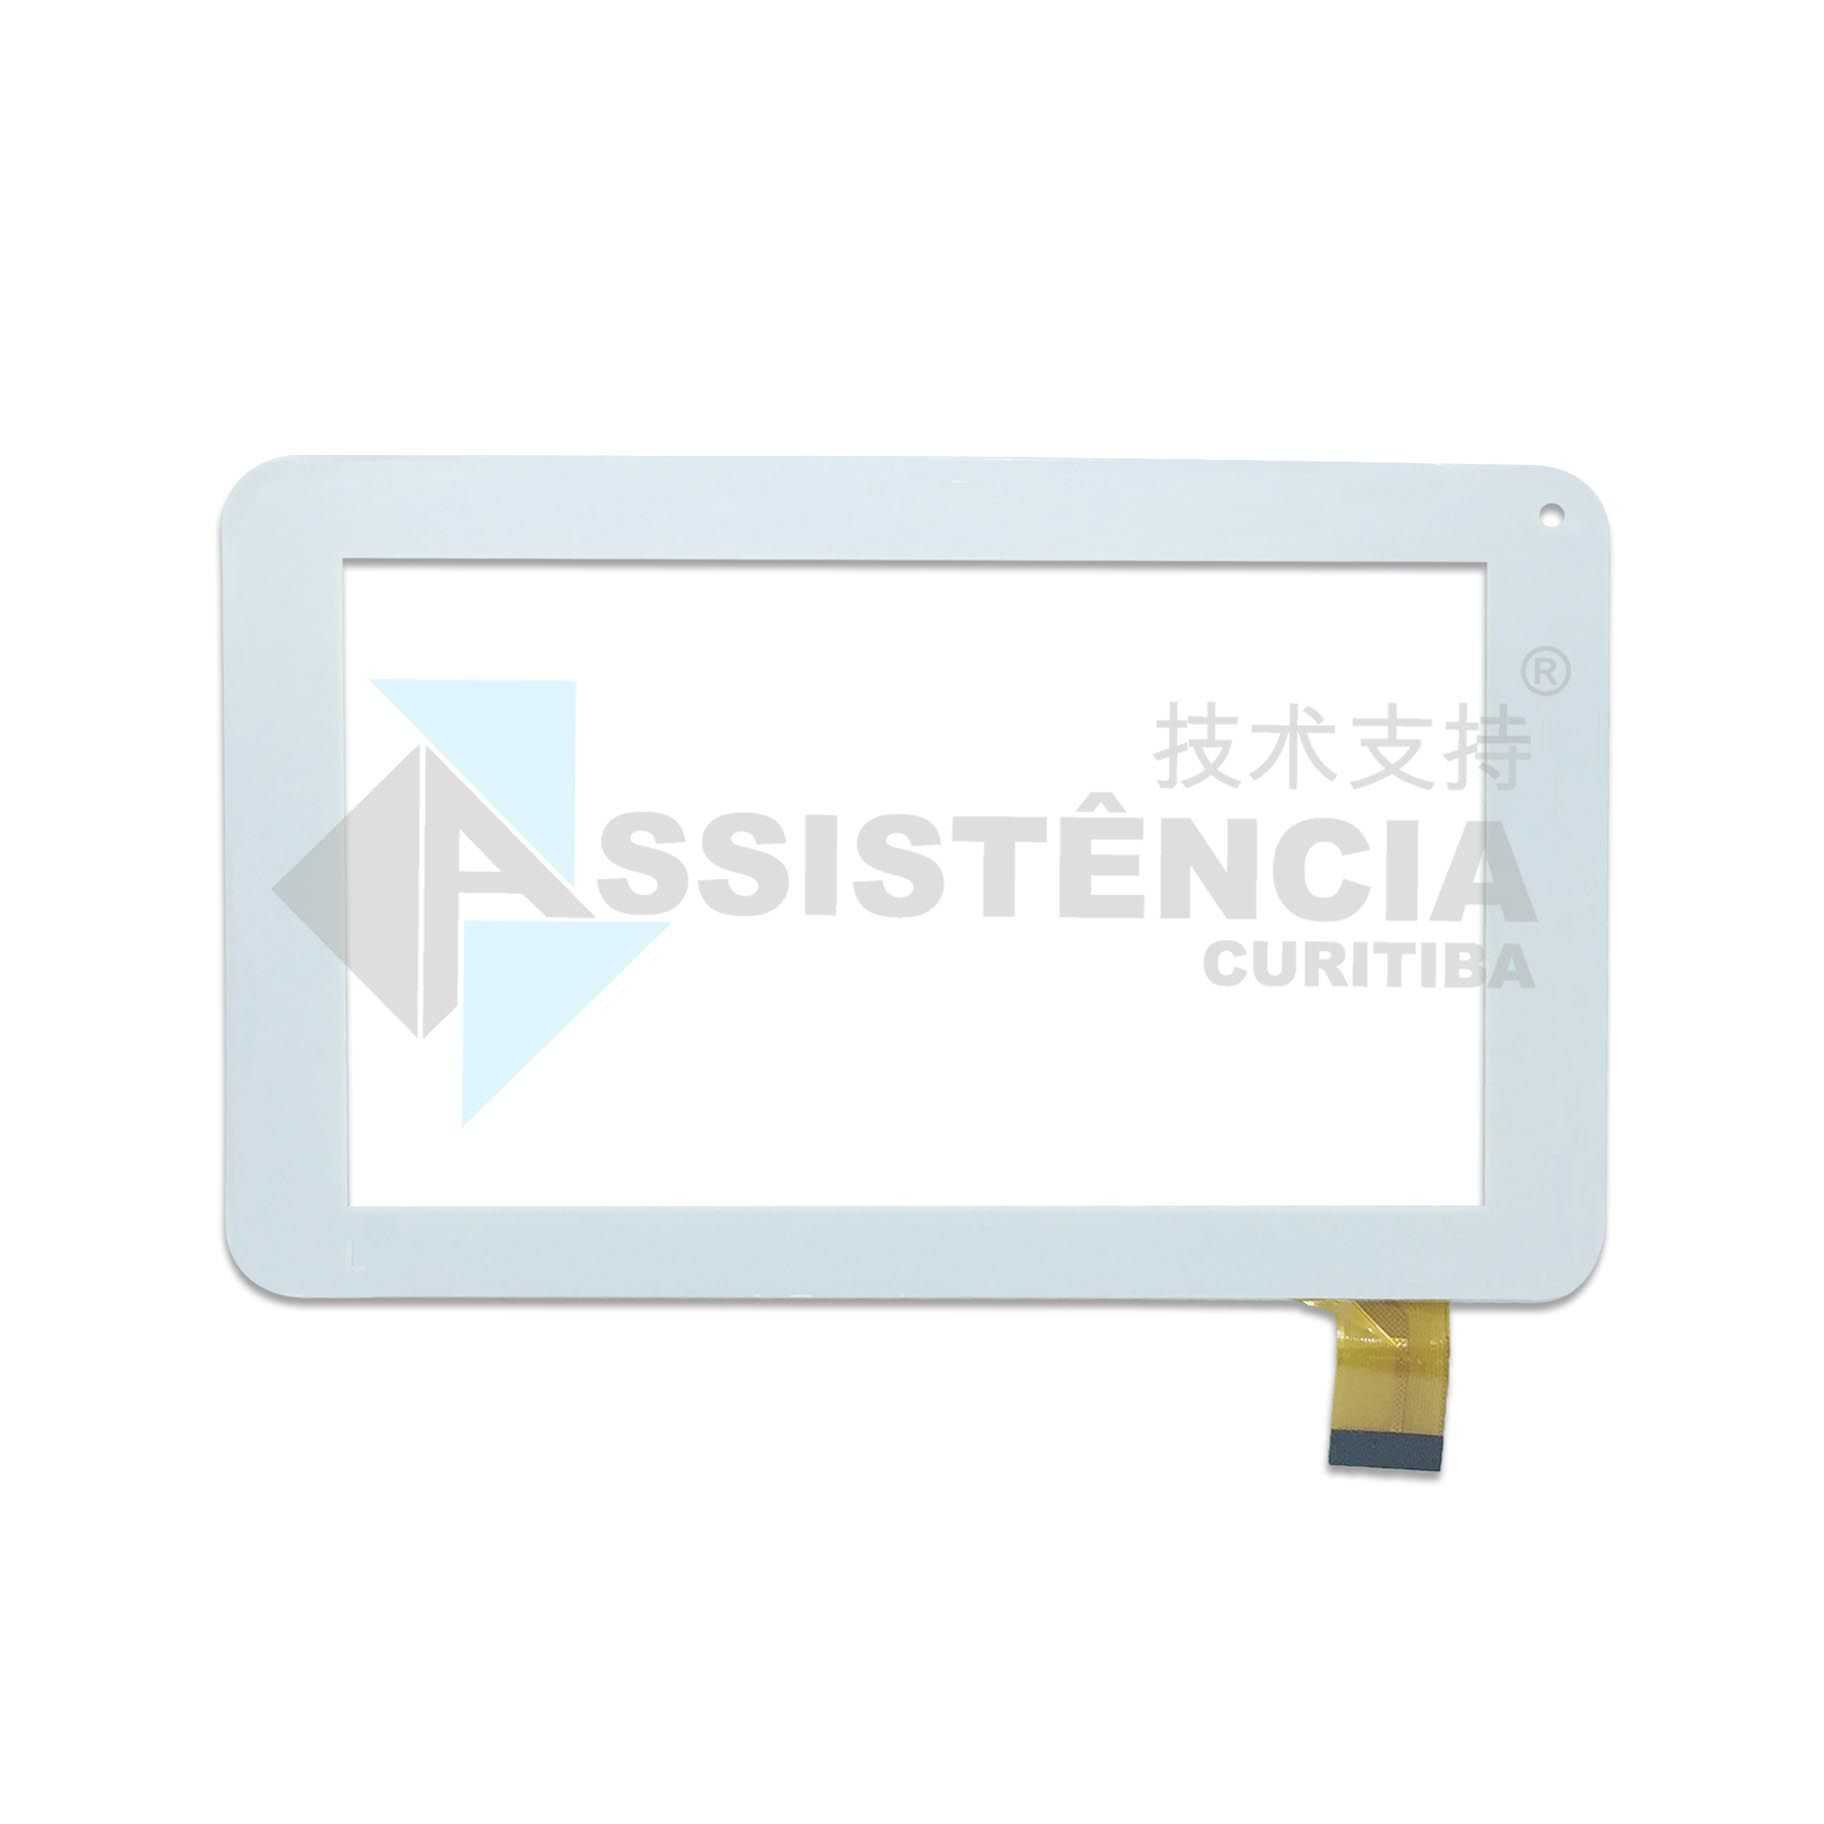 Tela Touch Bak Ibak 7301 Branco